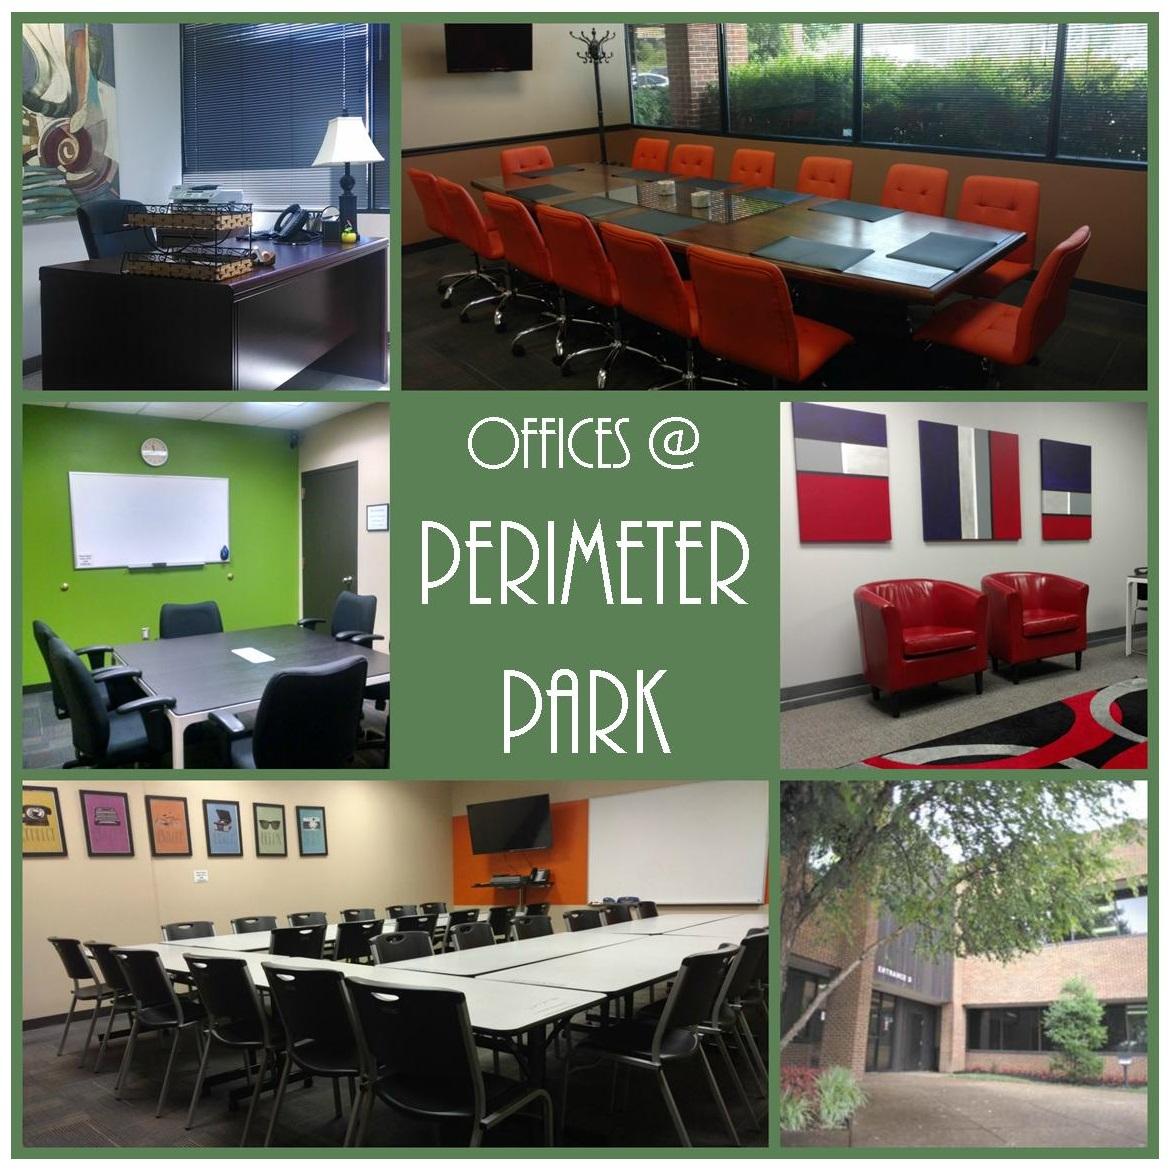 Offices At Perimeter Park | Nashville